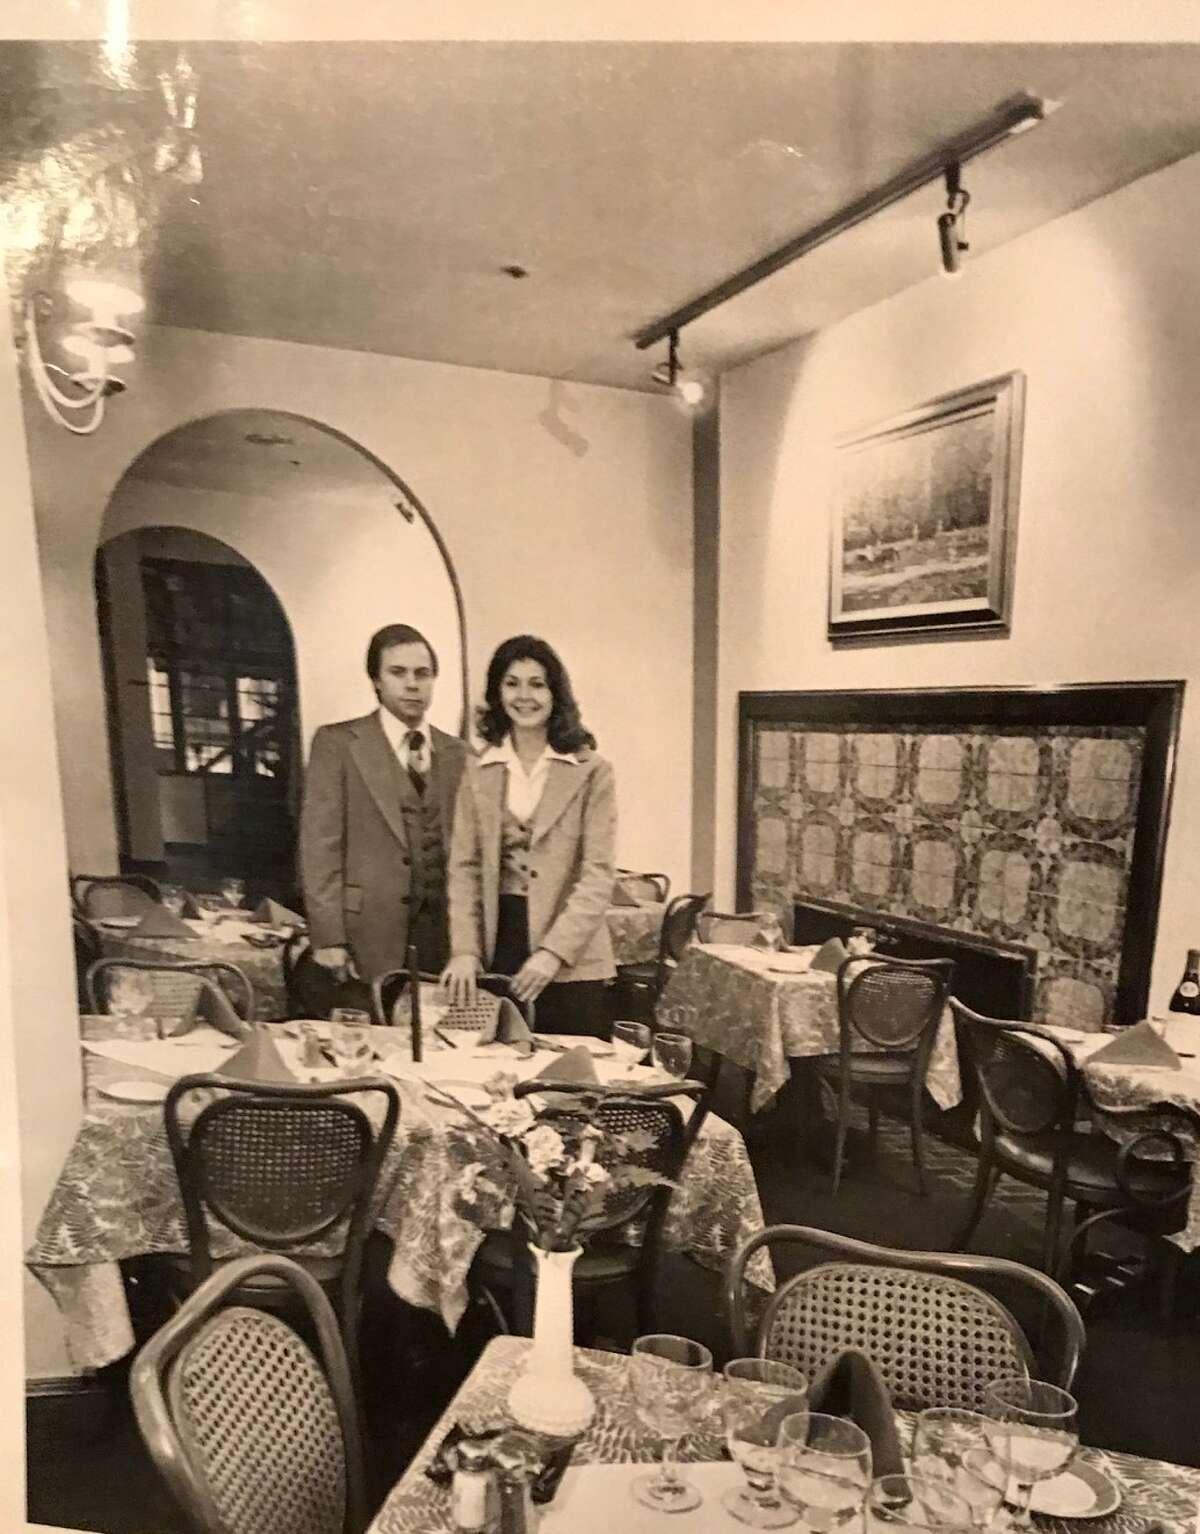 Photos for Grondahl column on Le Serre closing